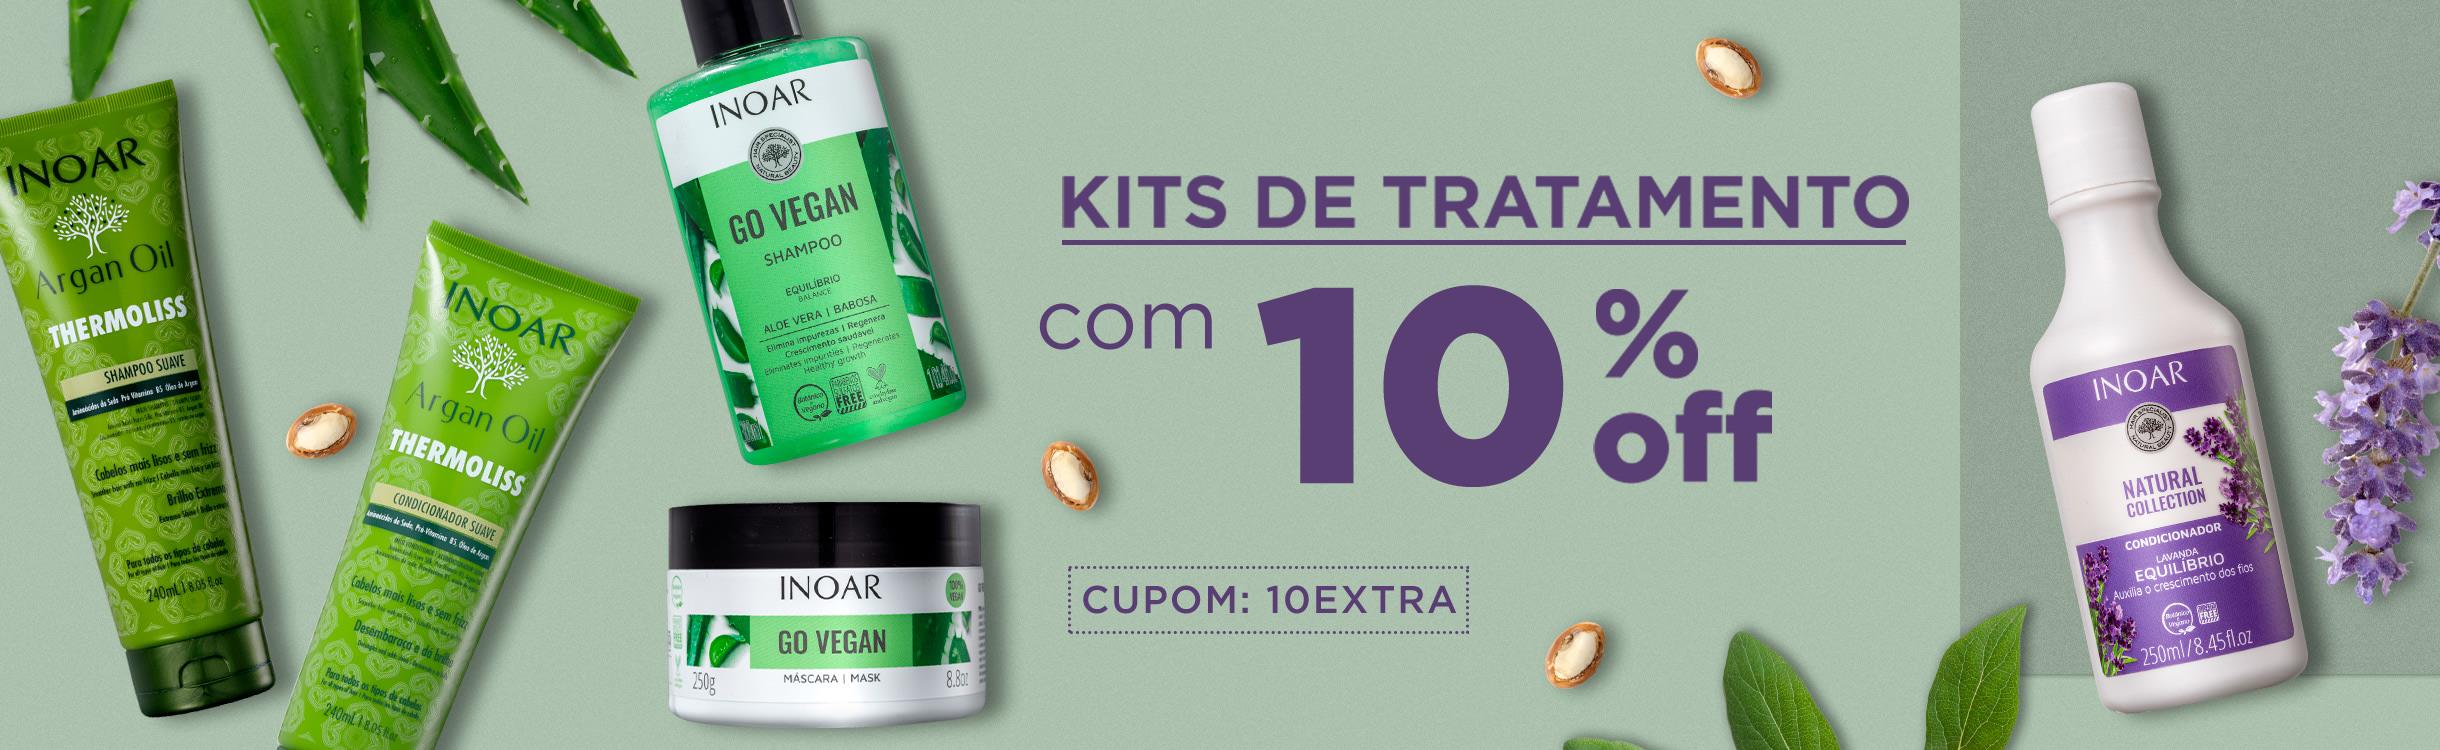 Kits Inoar de Tratamento